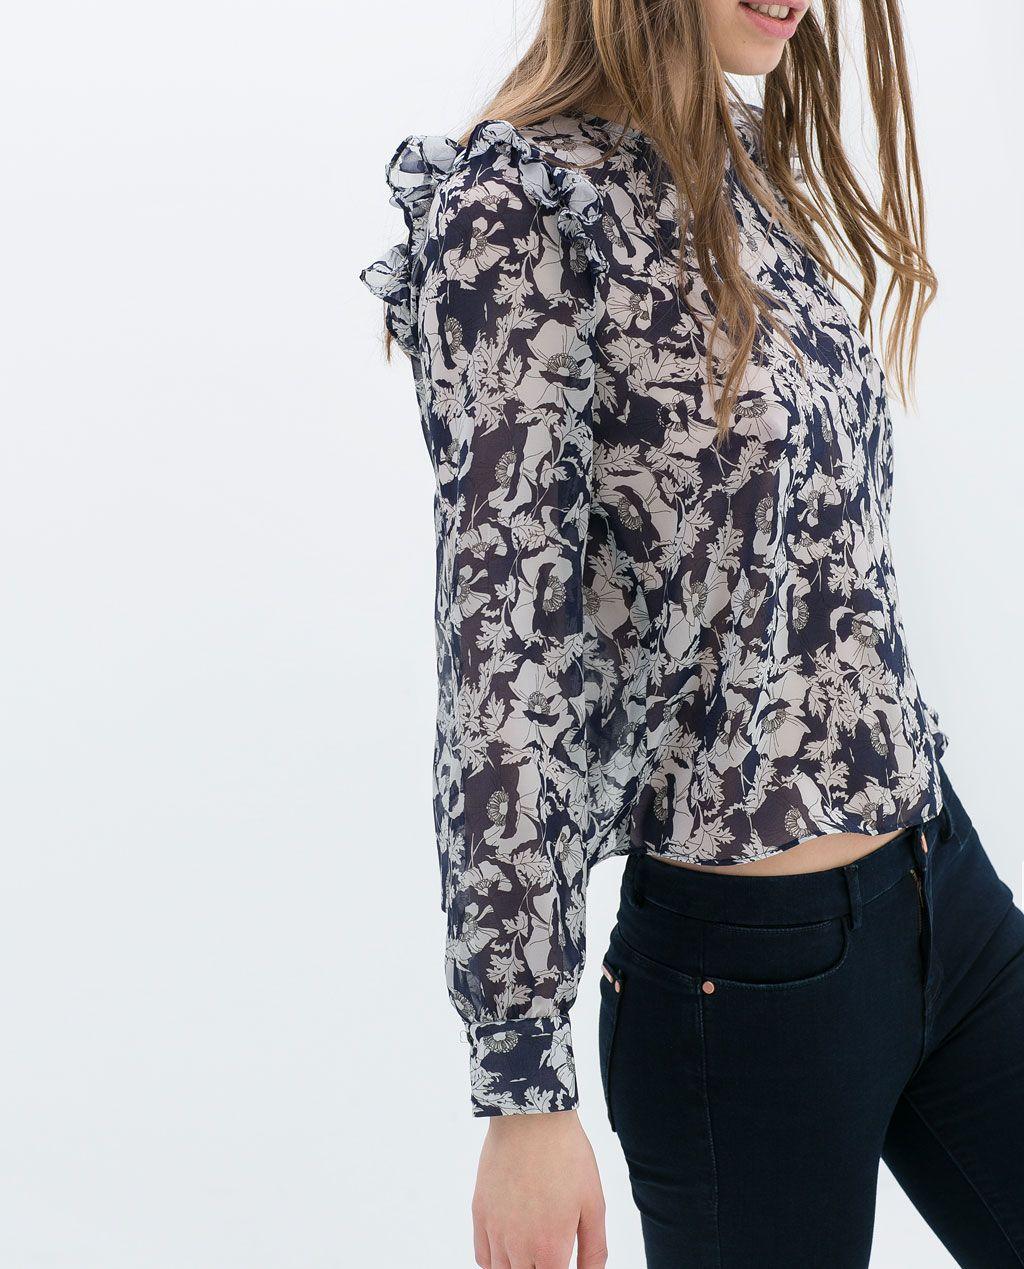 #TOP #VOLANTES @· ZARA · 25.95€ #primavera #moda #tendencia #estampado